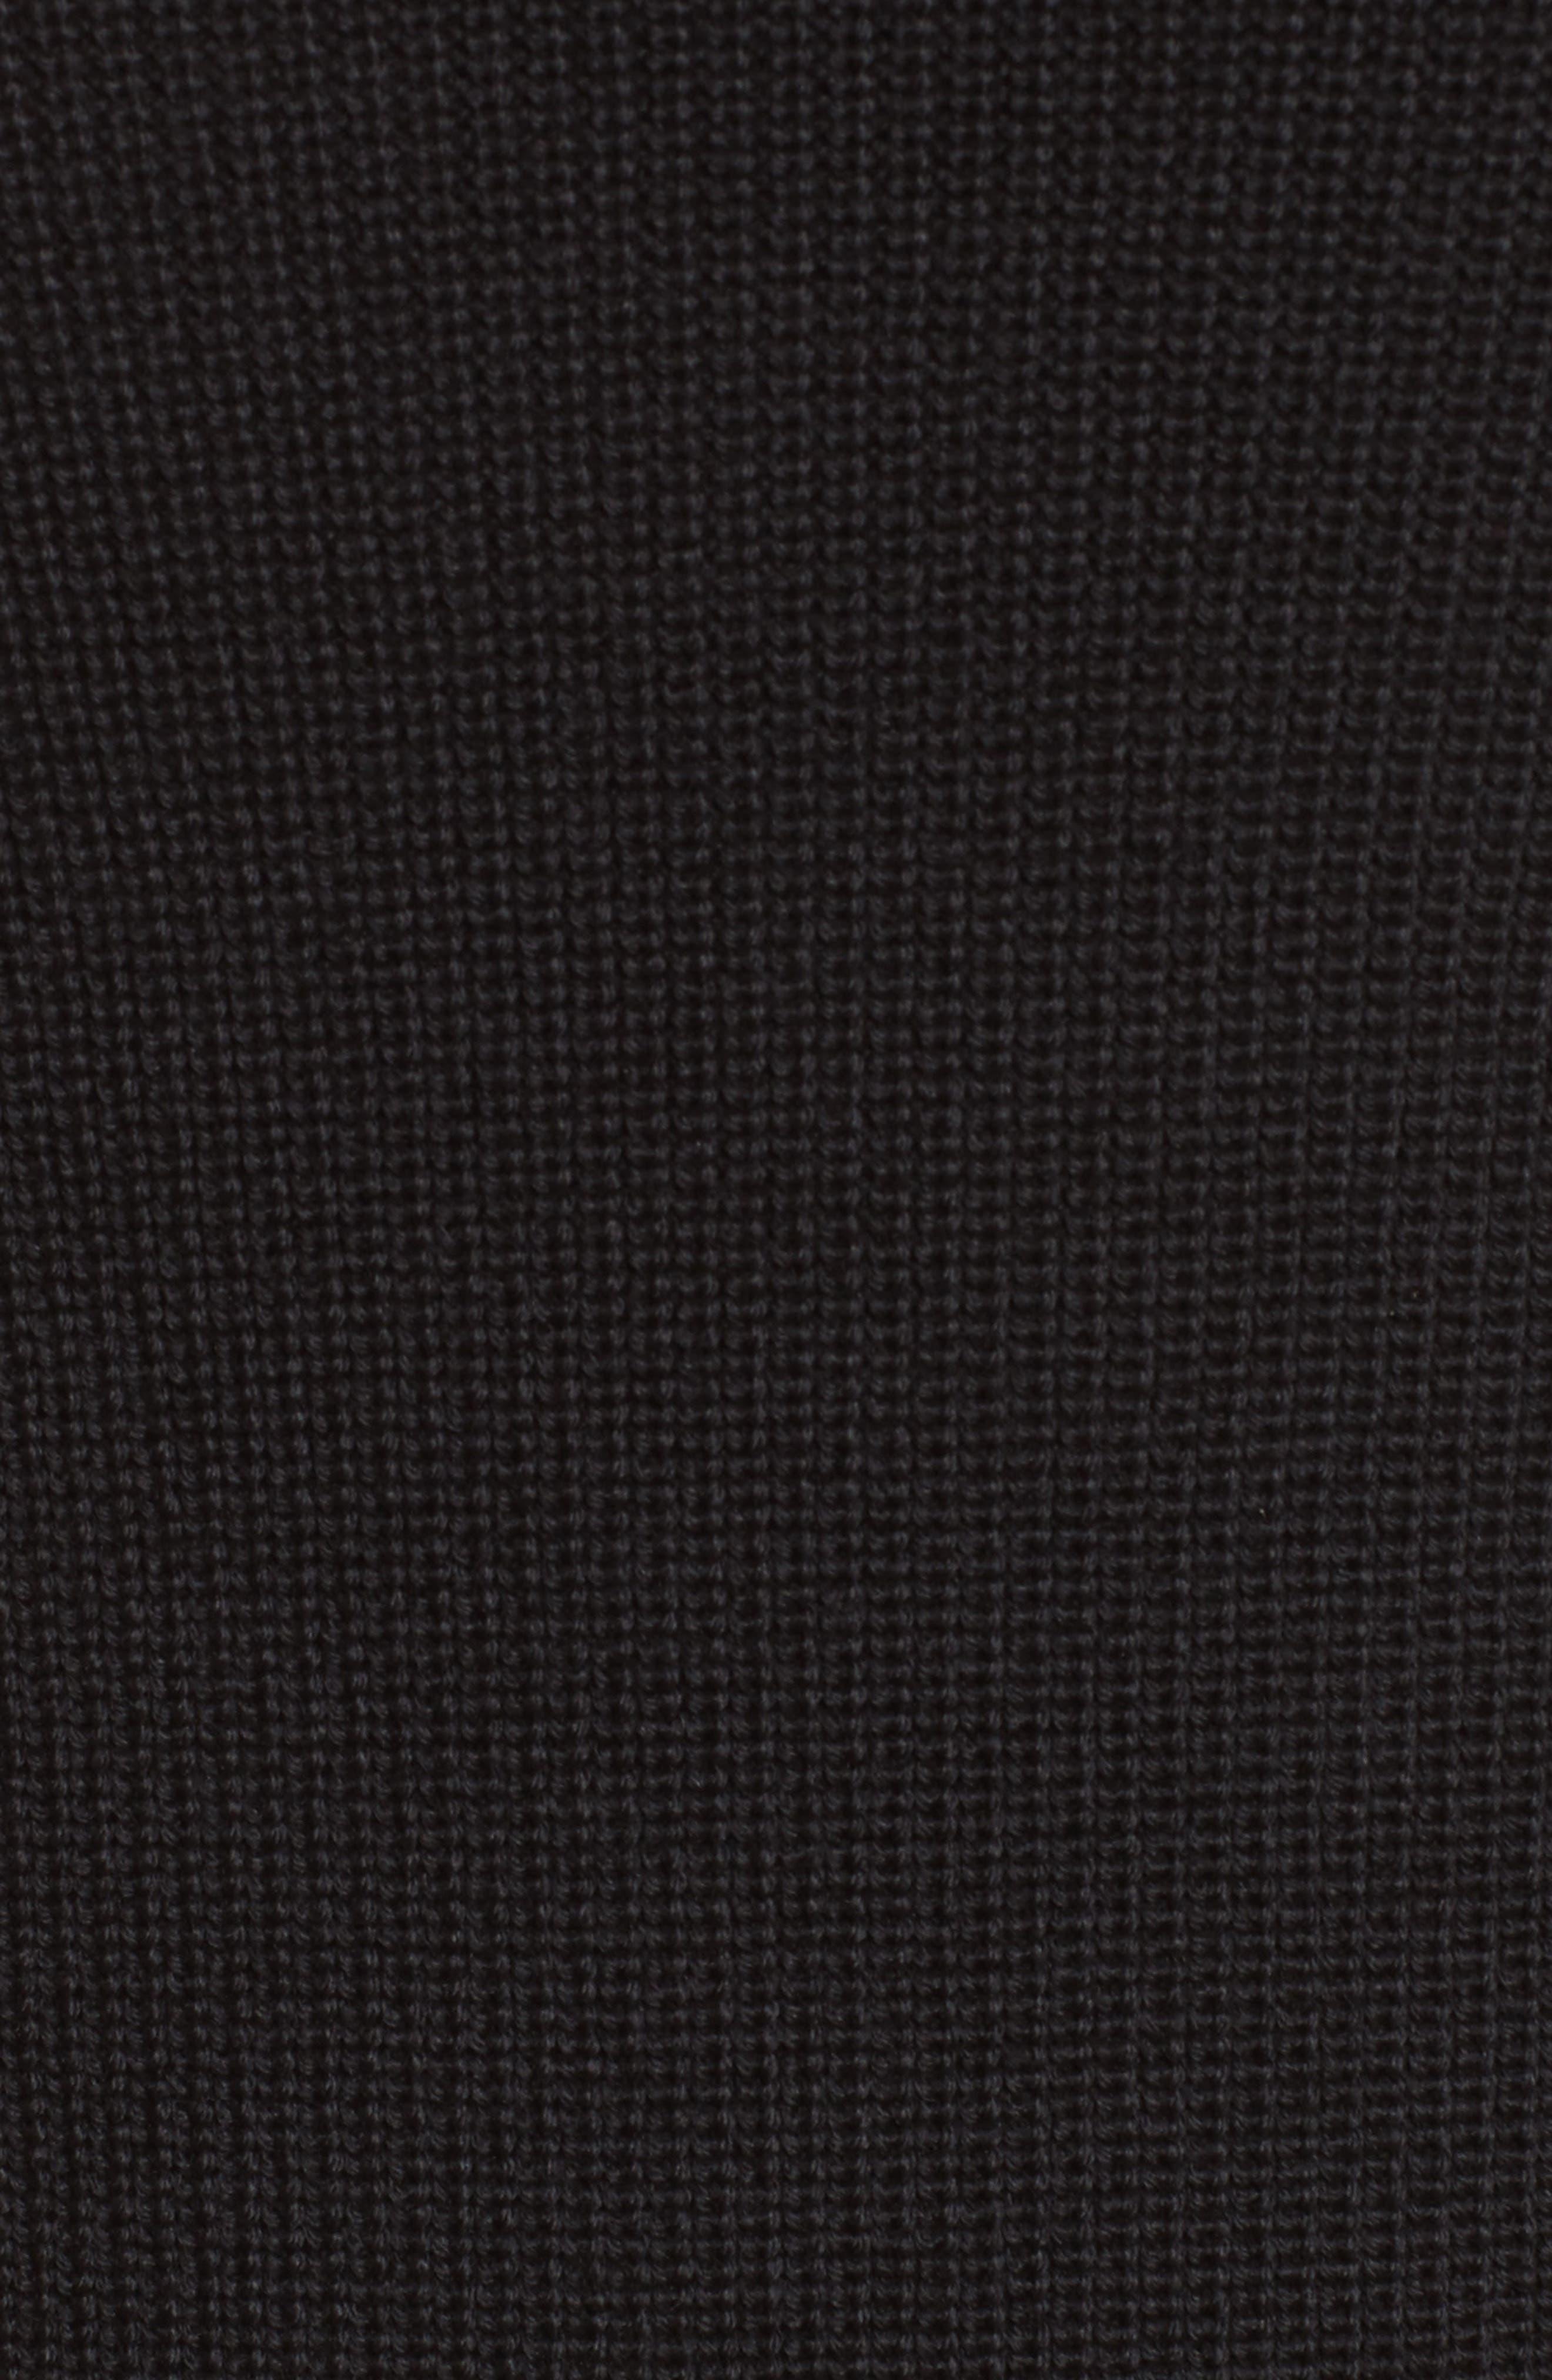 Virgin Wool Front Slit Tunic,                             Alternate thumbnail 6, color,                             Black